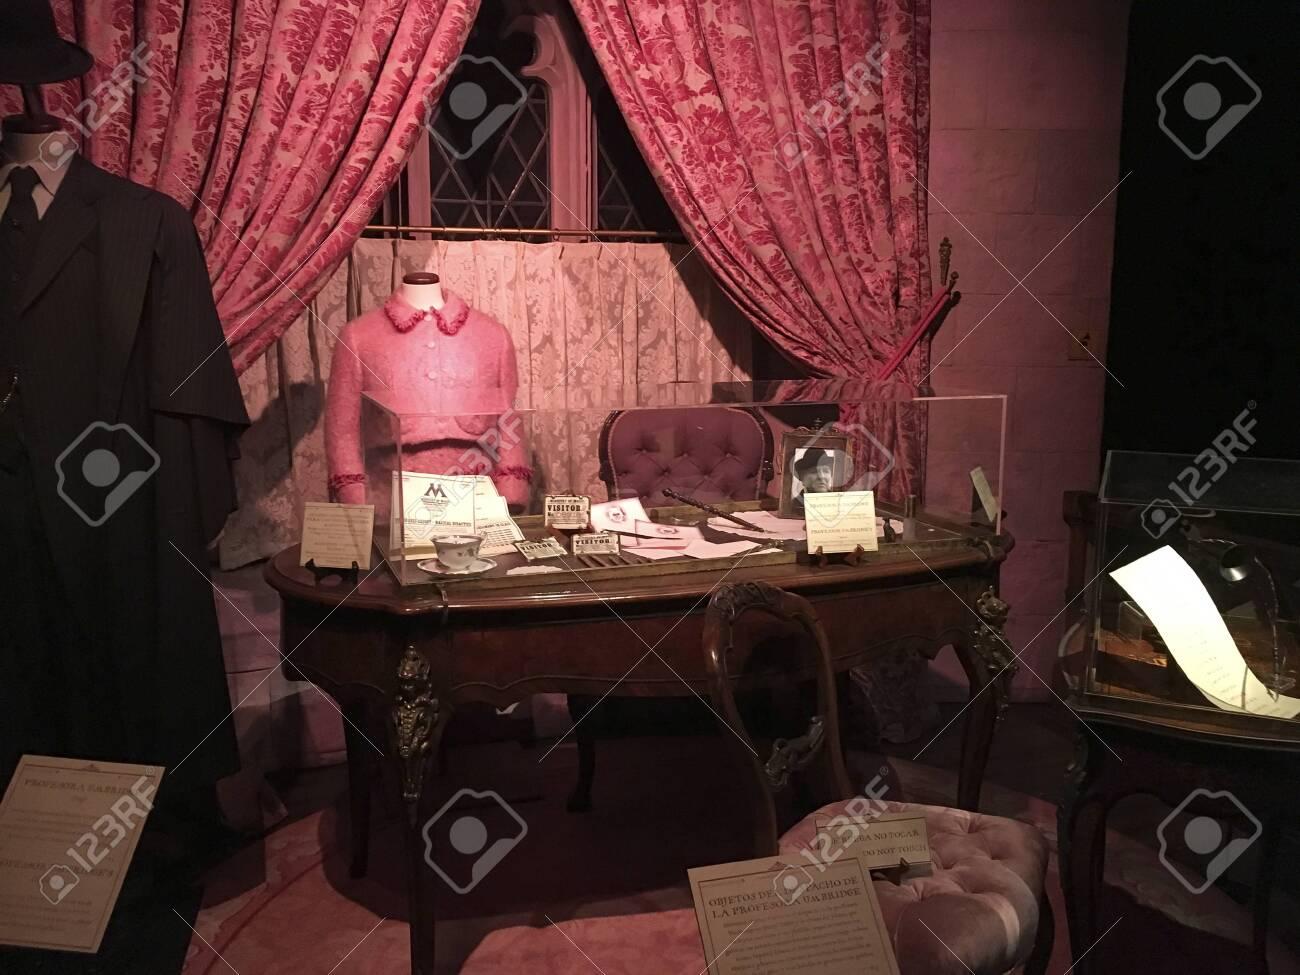 Madrid, Spain; November 26, 2017; Exhibition of original Harry Potter material at Ifema, Pavilion 1. - 132893806